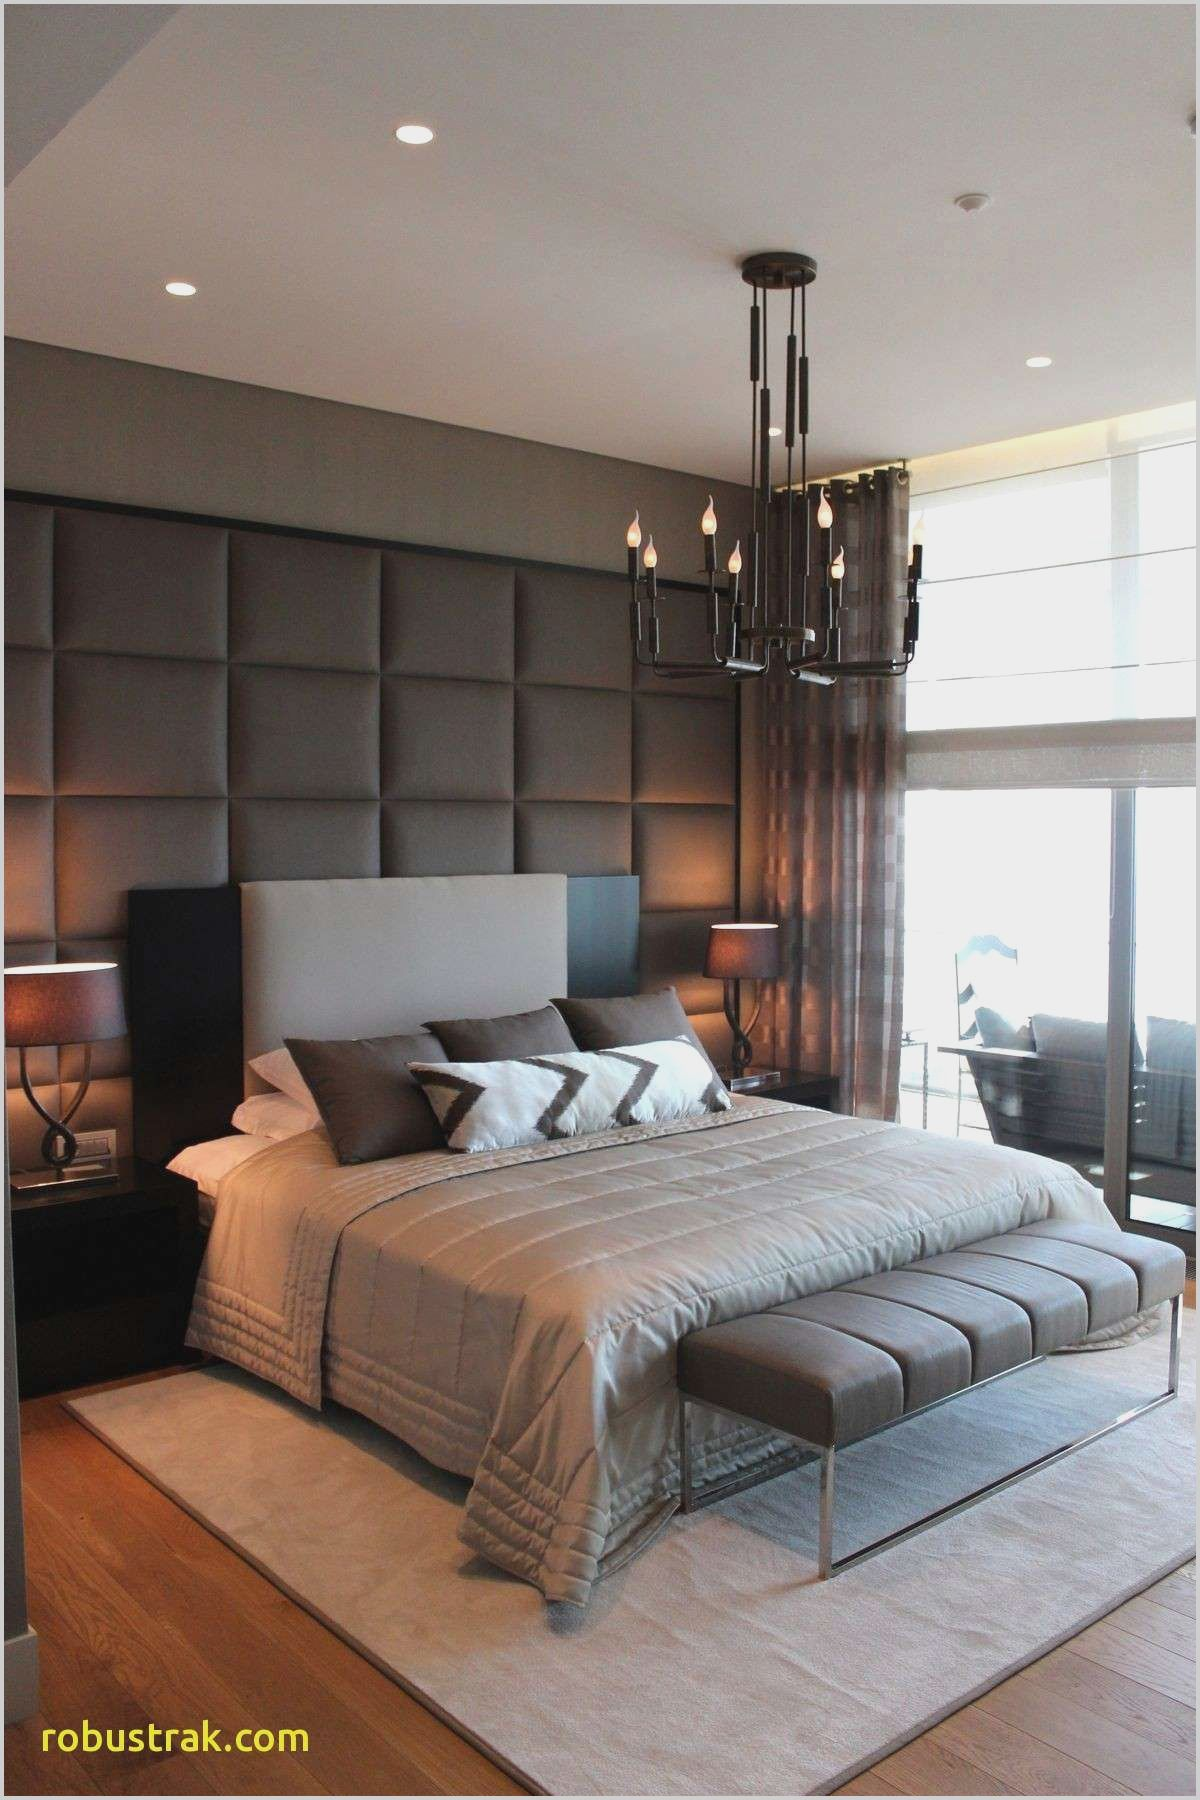 Modern Contemporary Bedroom Decorating Ideas In 2020 Bedroom Designs For Couples Modern Bedroom Small Master Bedroom